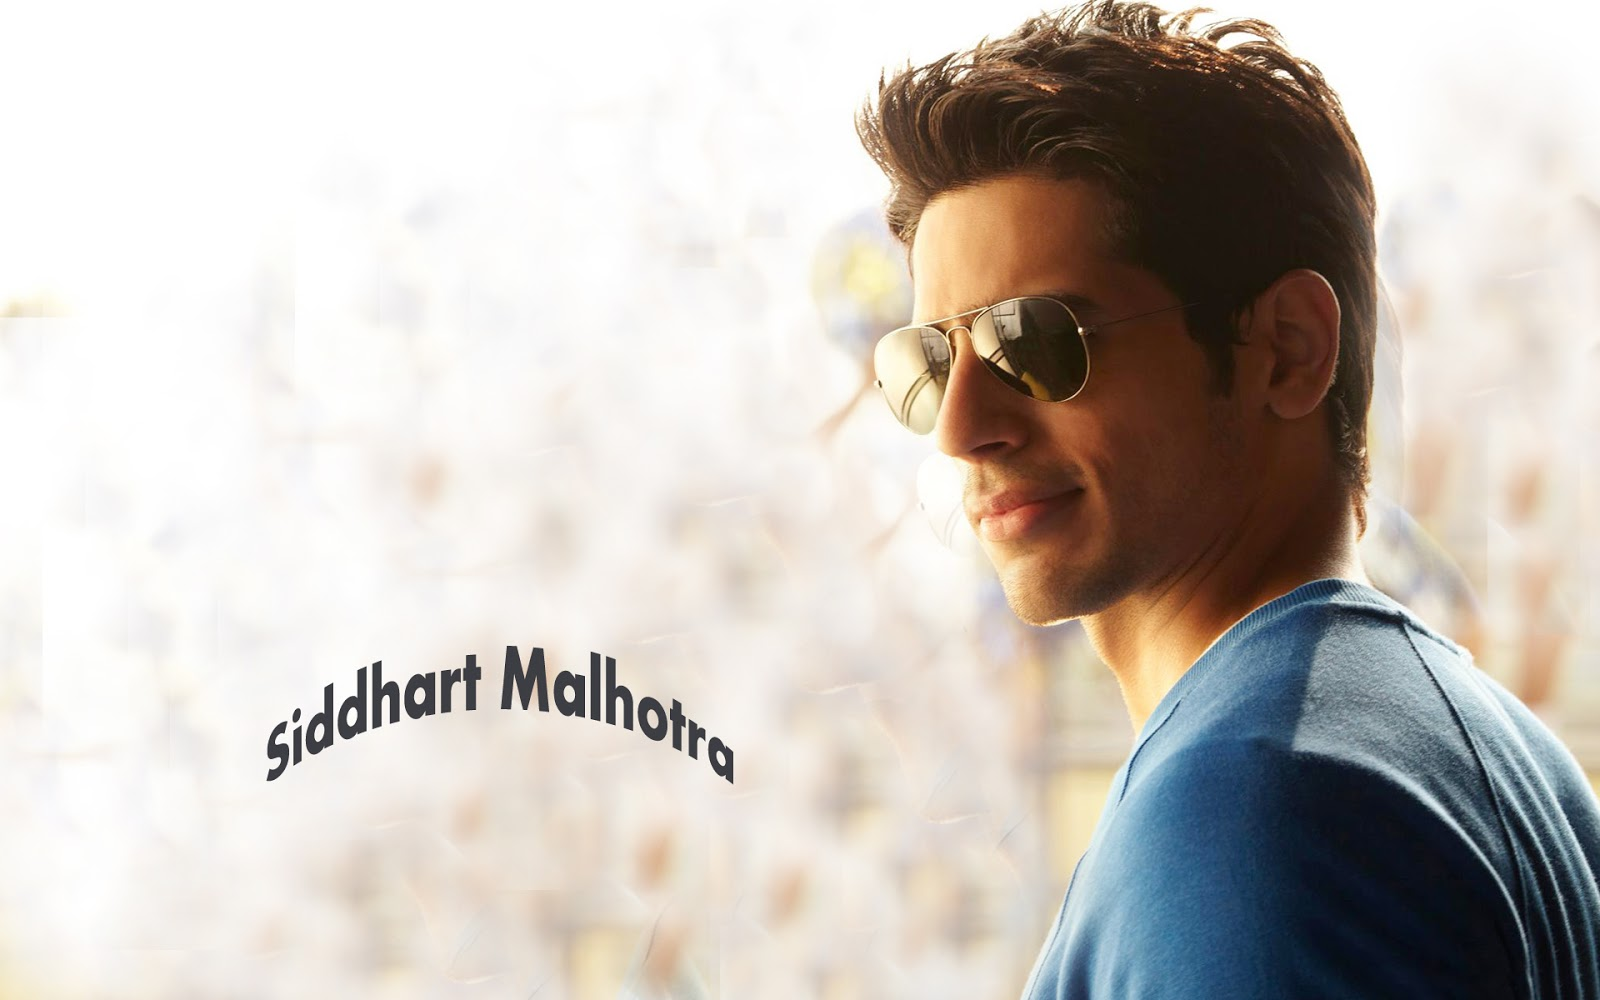 Sad Love Wallpapers Hd In Hindi Ravishment Sidharth Malhotra Bollywood Actors Hd